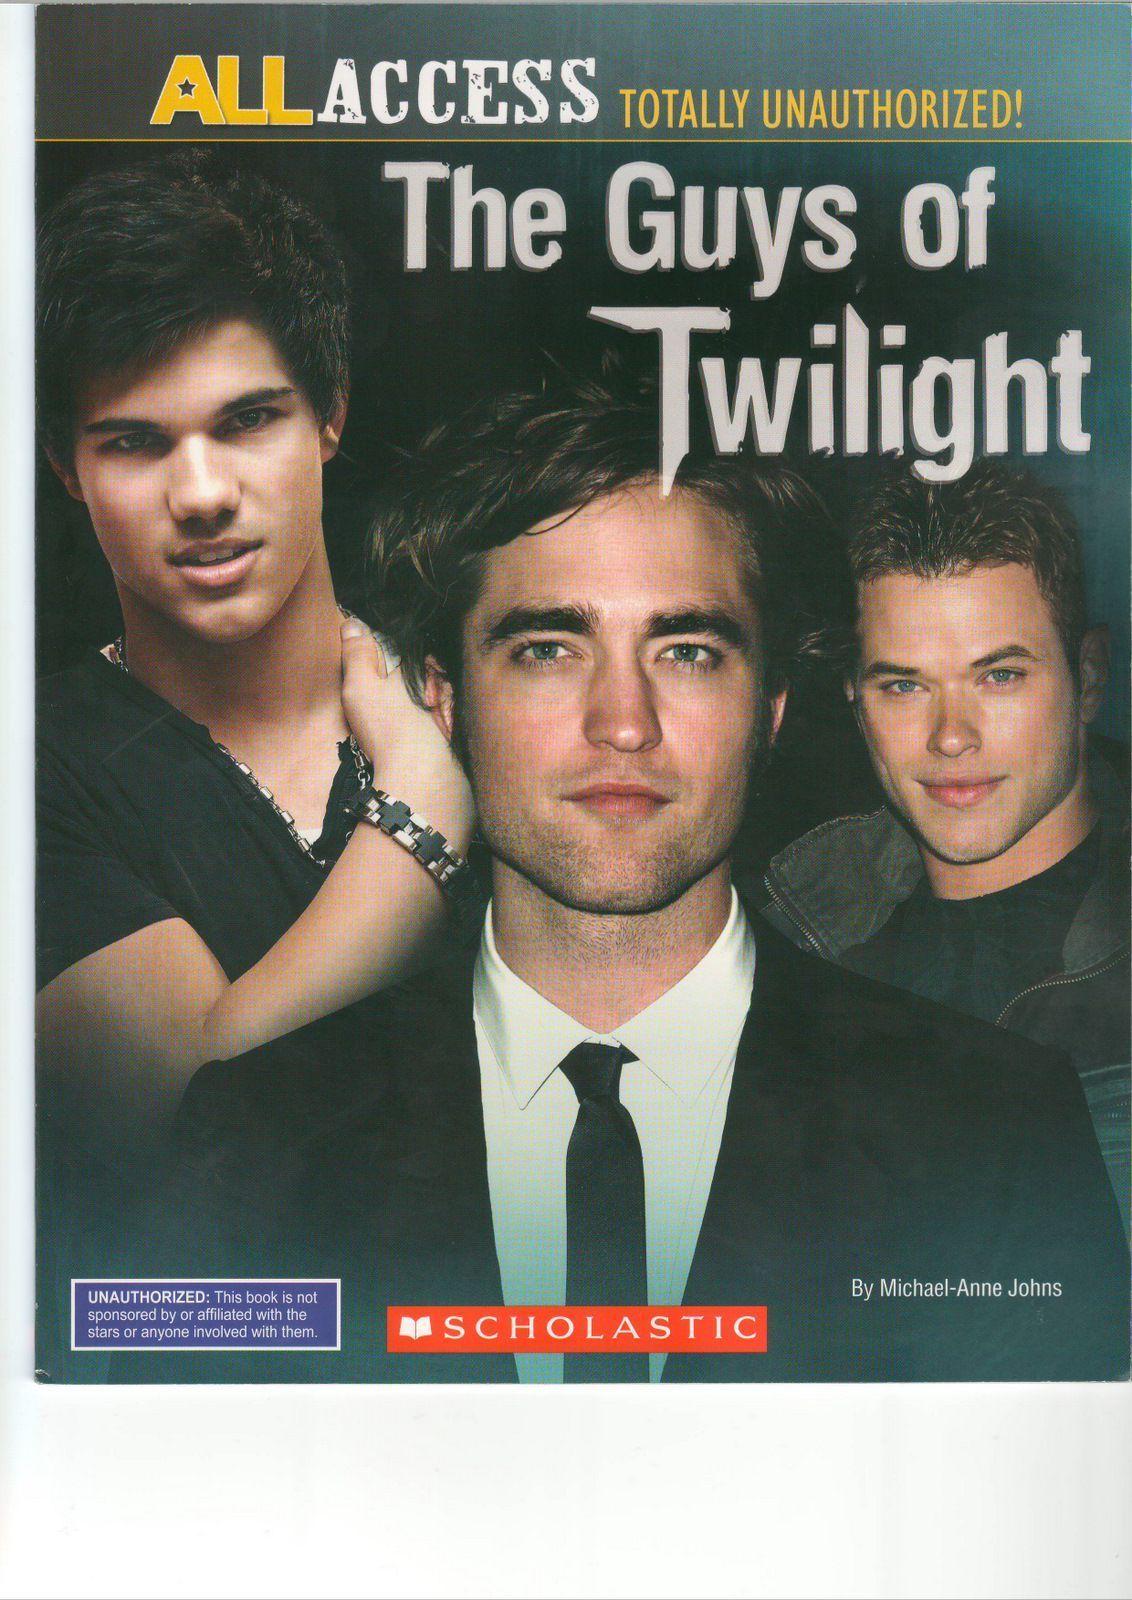 'The Guys of Twilight'